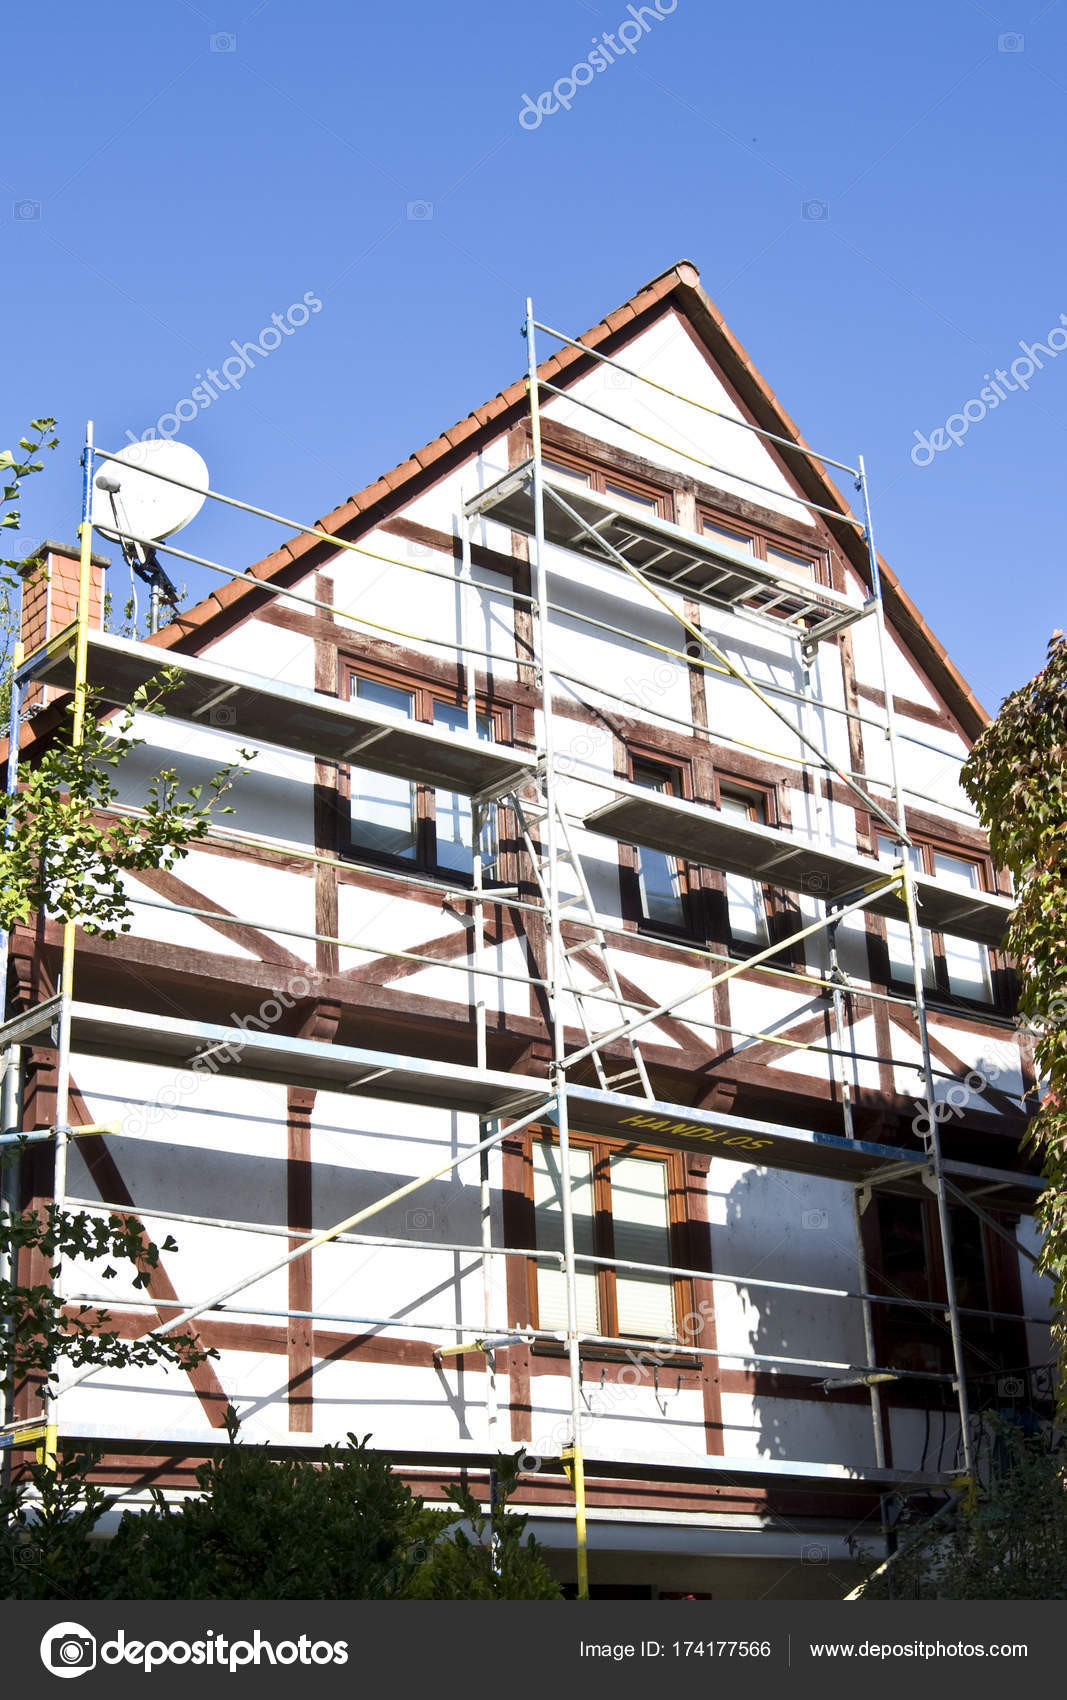 Casa Madera Con Andamio Para Reconstruir Marco Hessen Alemania ...